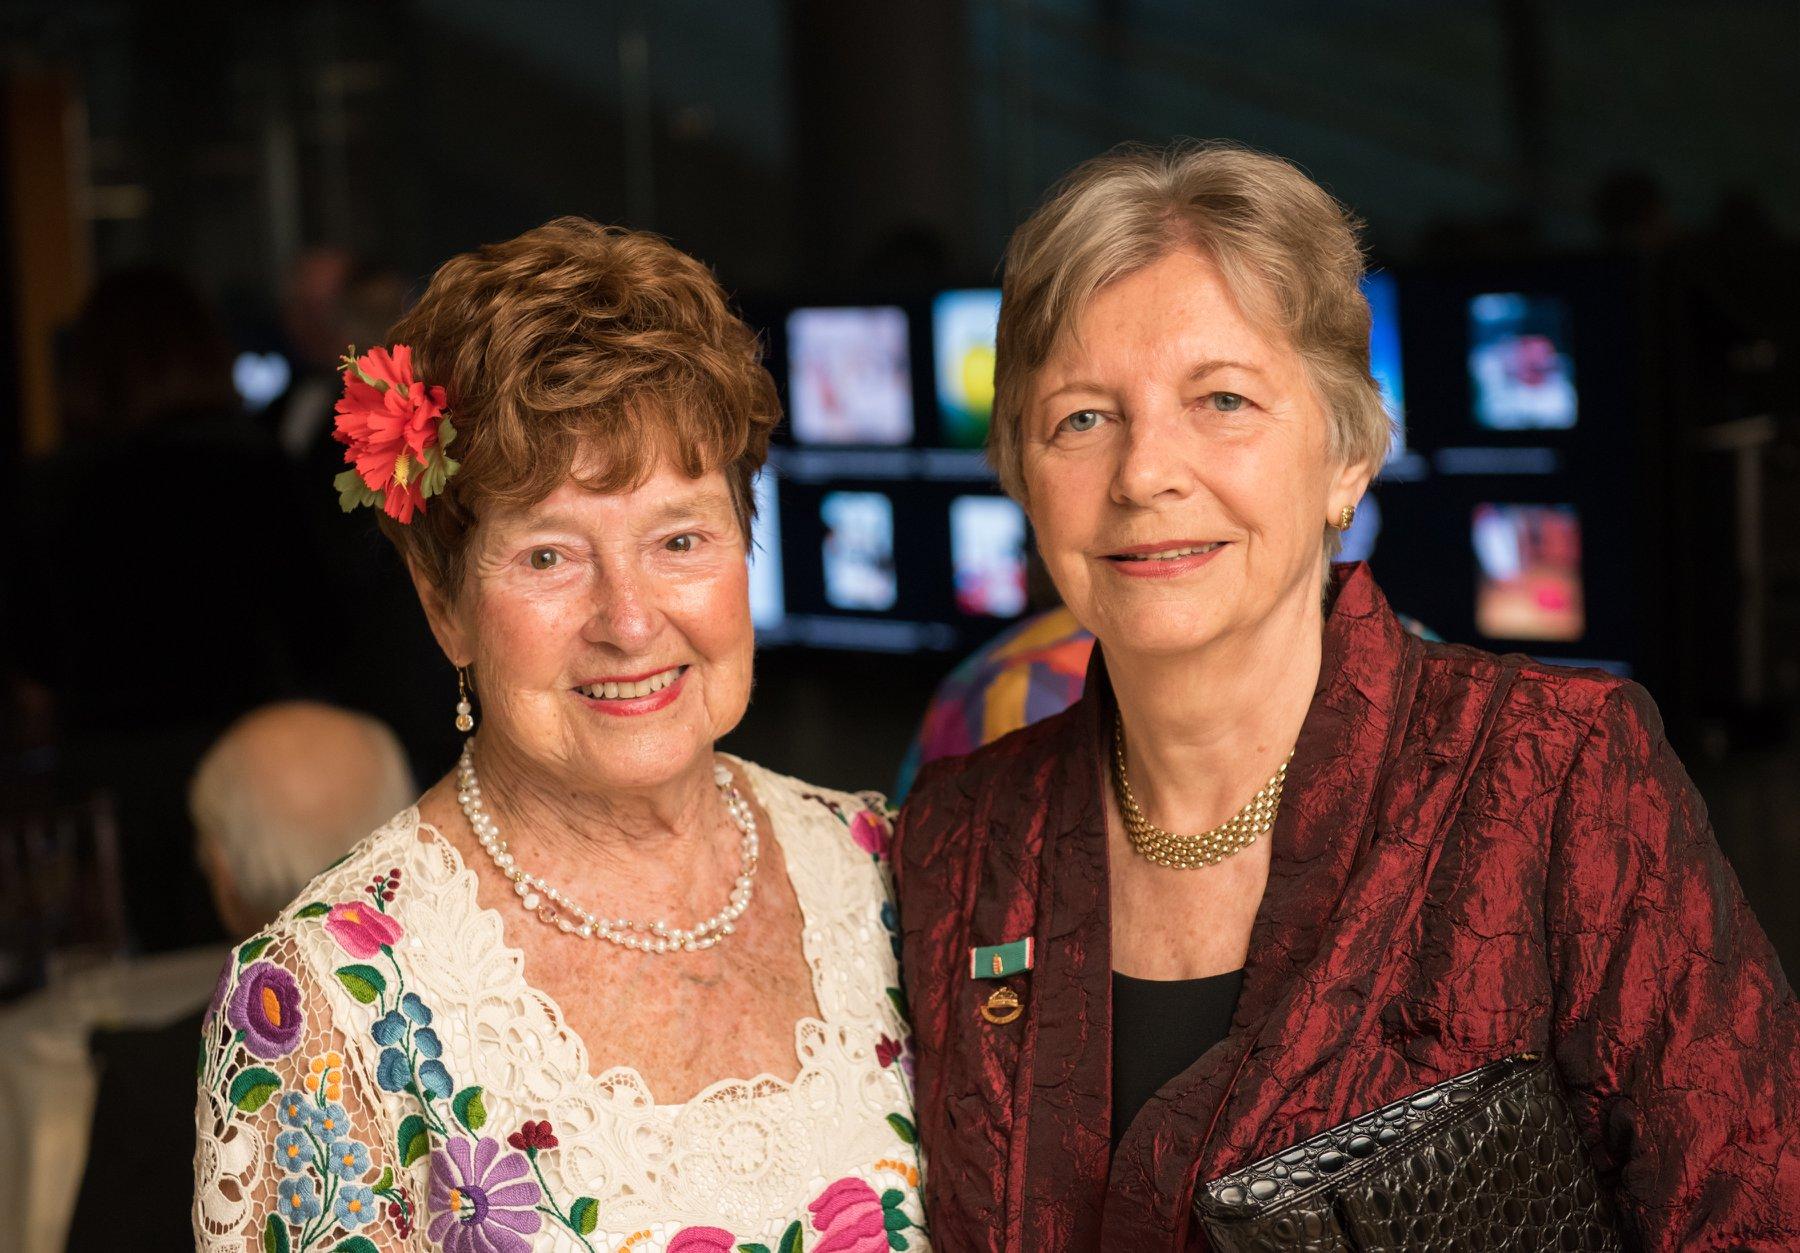 Gala honoree Dr. Jenny Brown and HAC Chair Emerita Edith K. Lauer